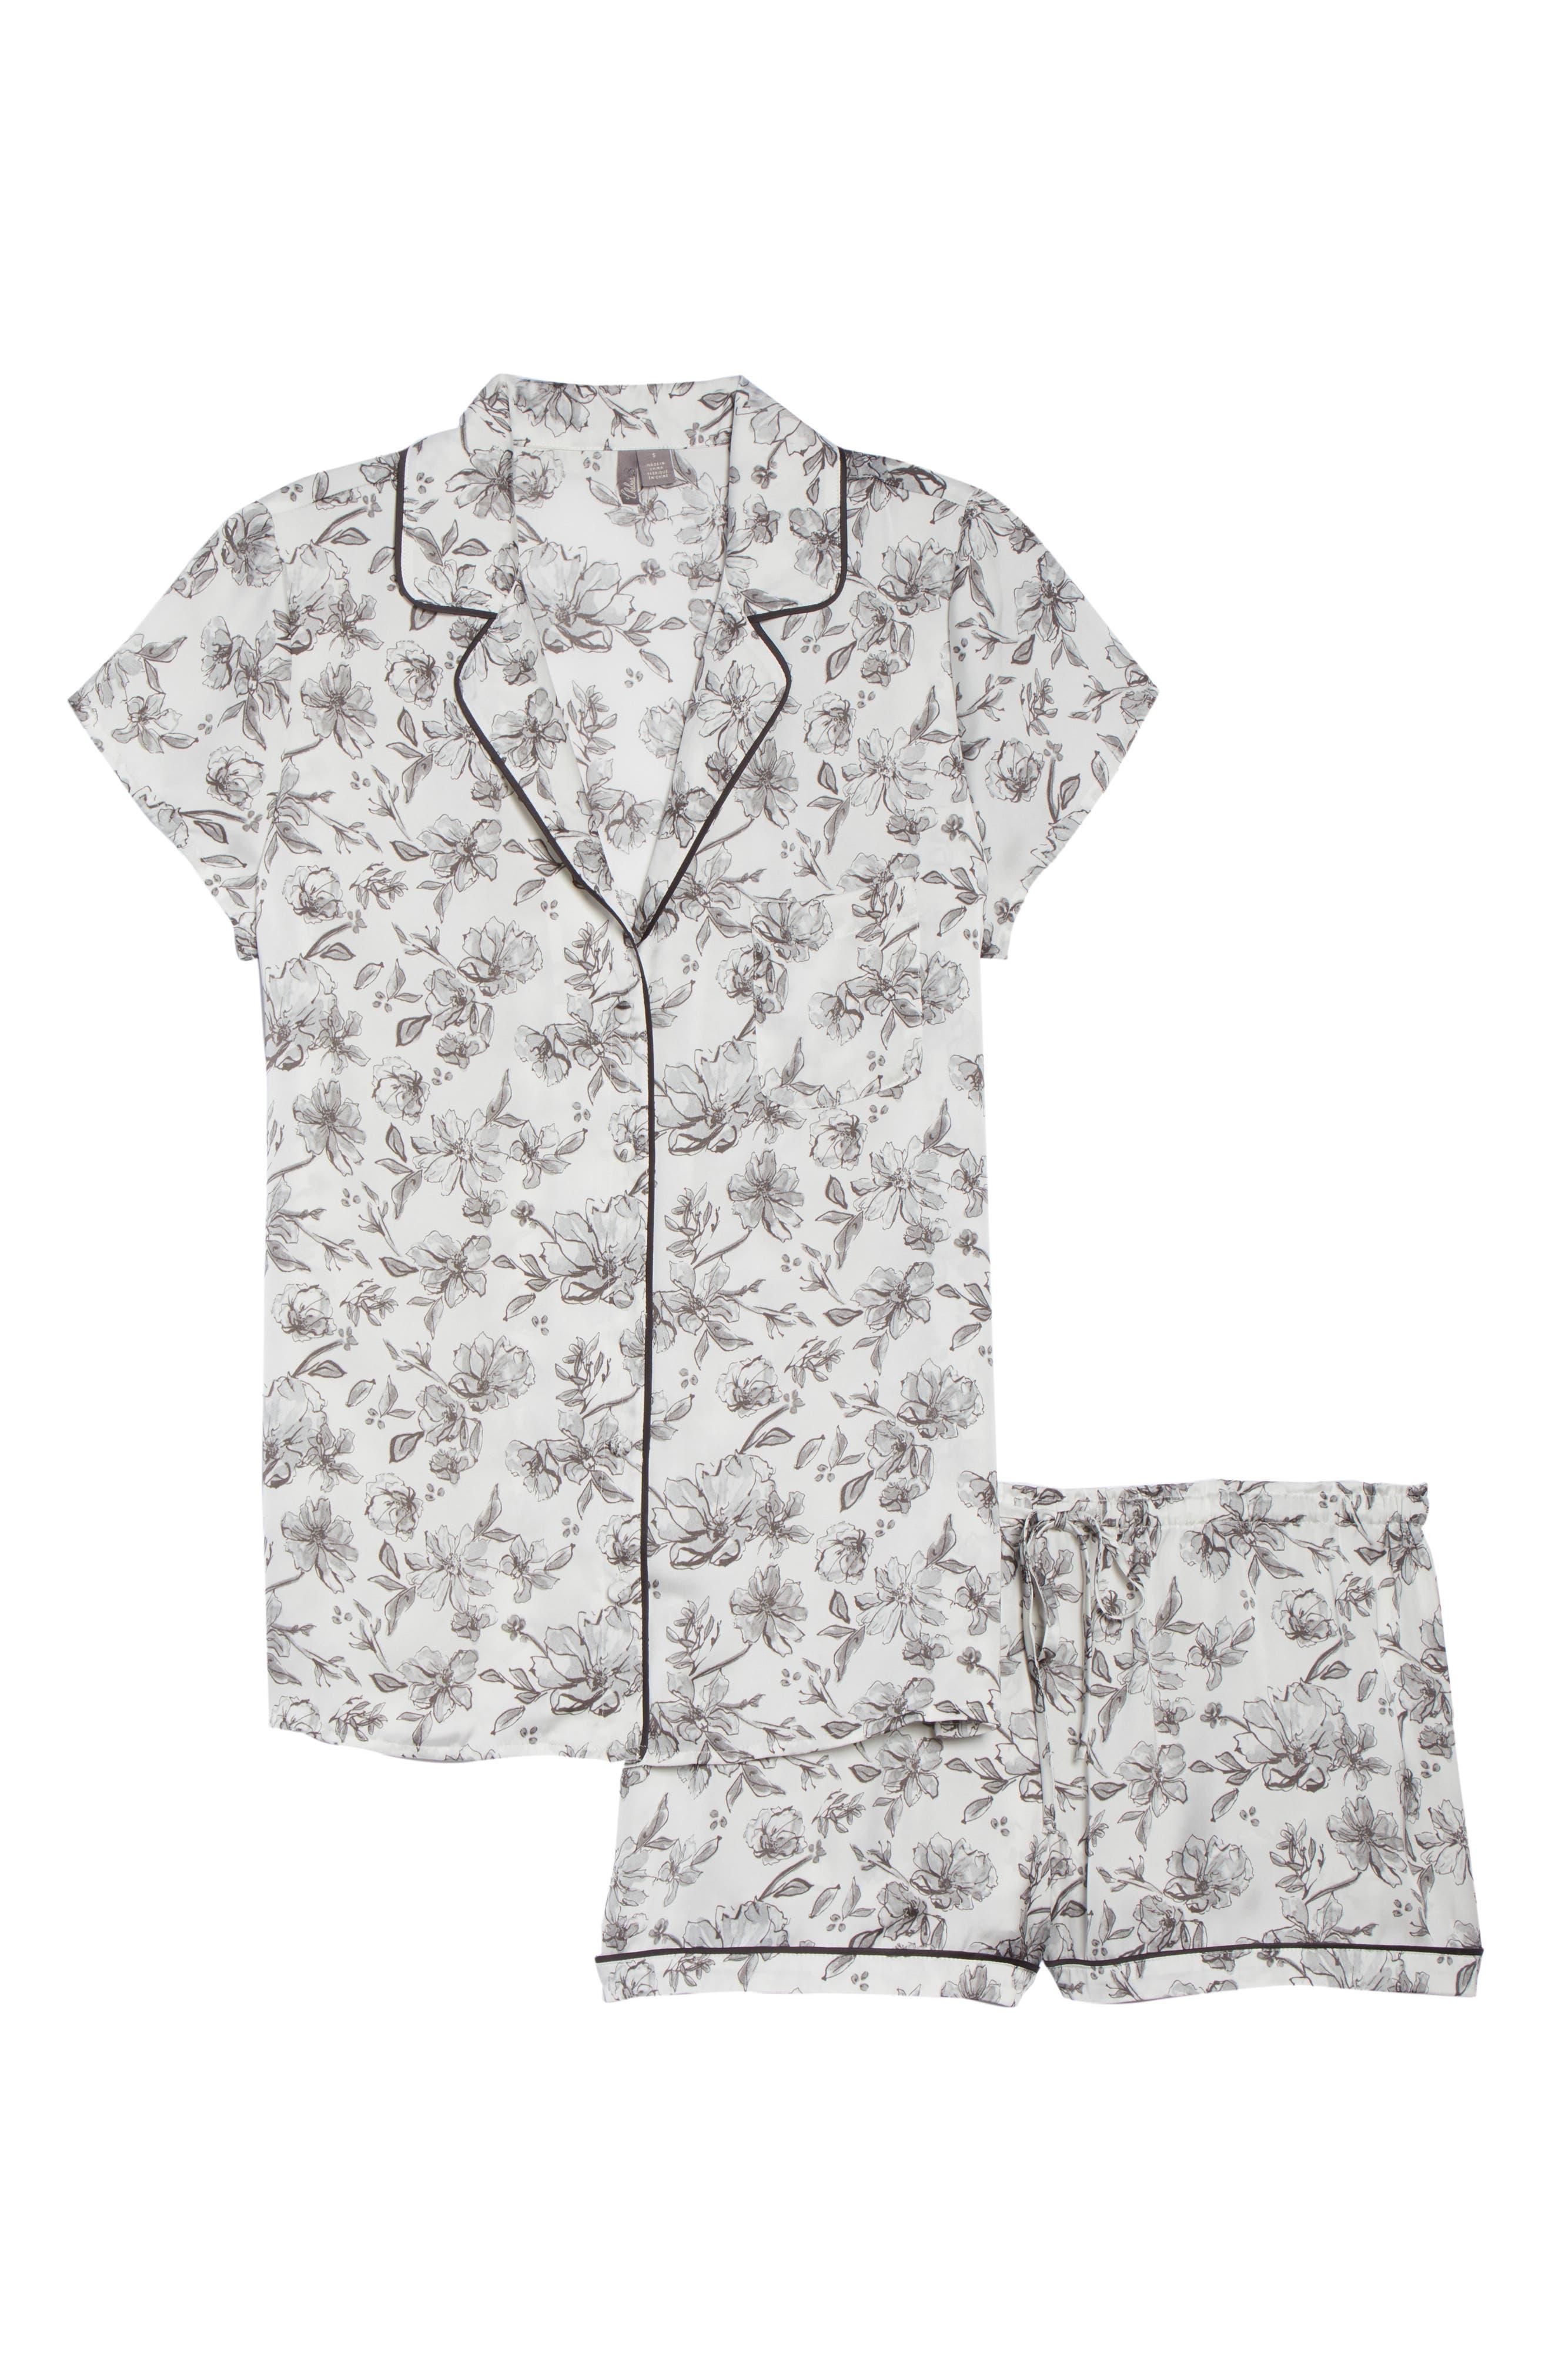 Satin Pajamas,                             Alternate thumbnail 6, color,                             IVORY EGRET LOVELY FLORAL